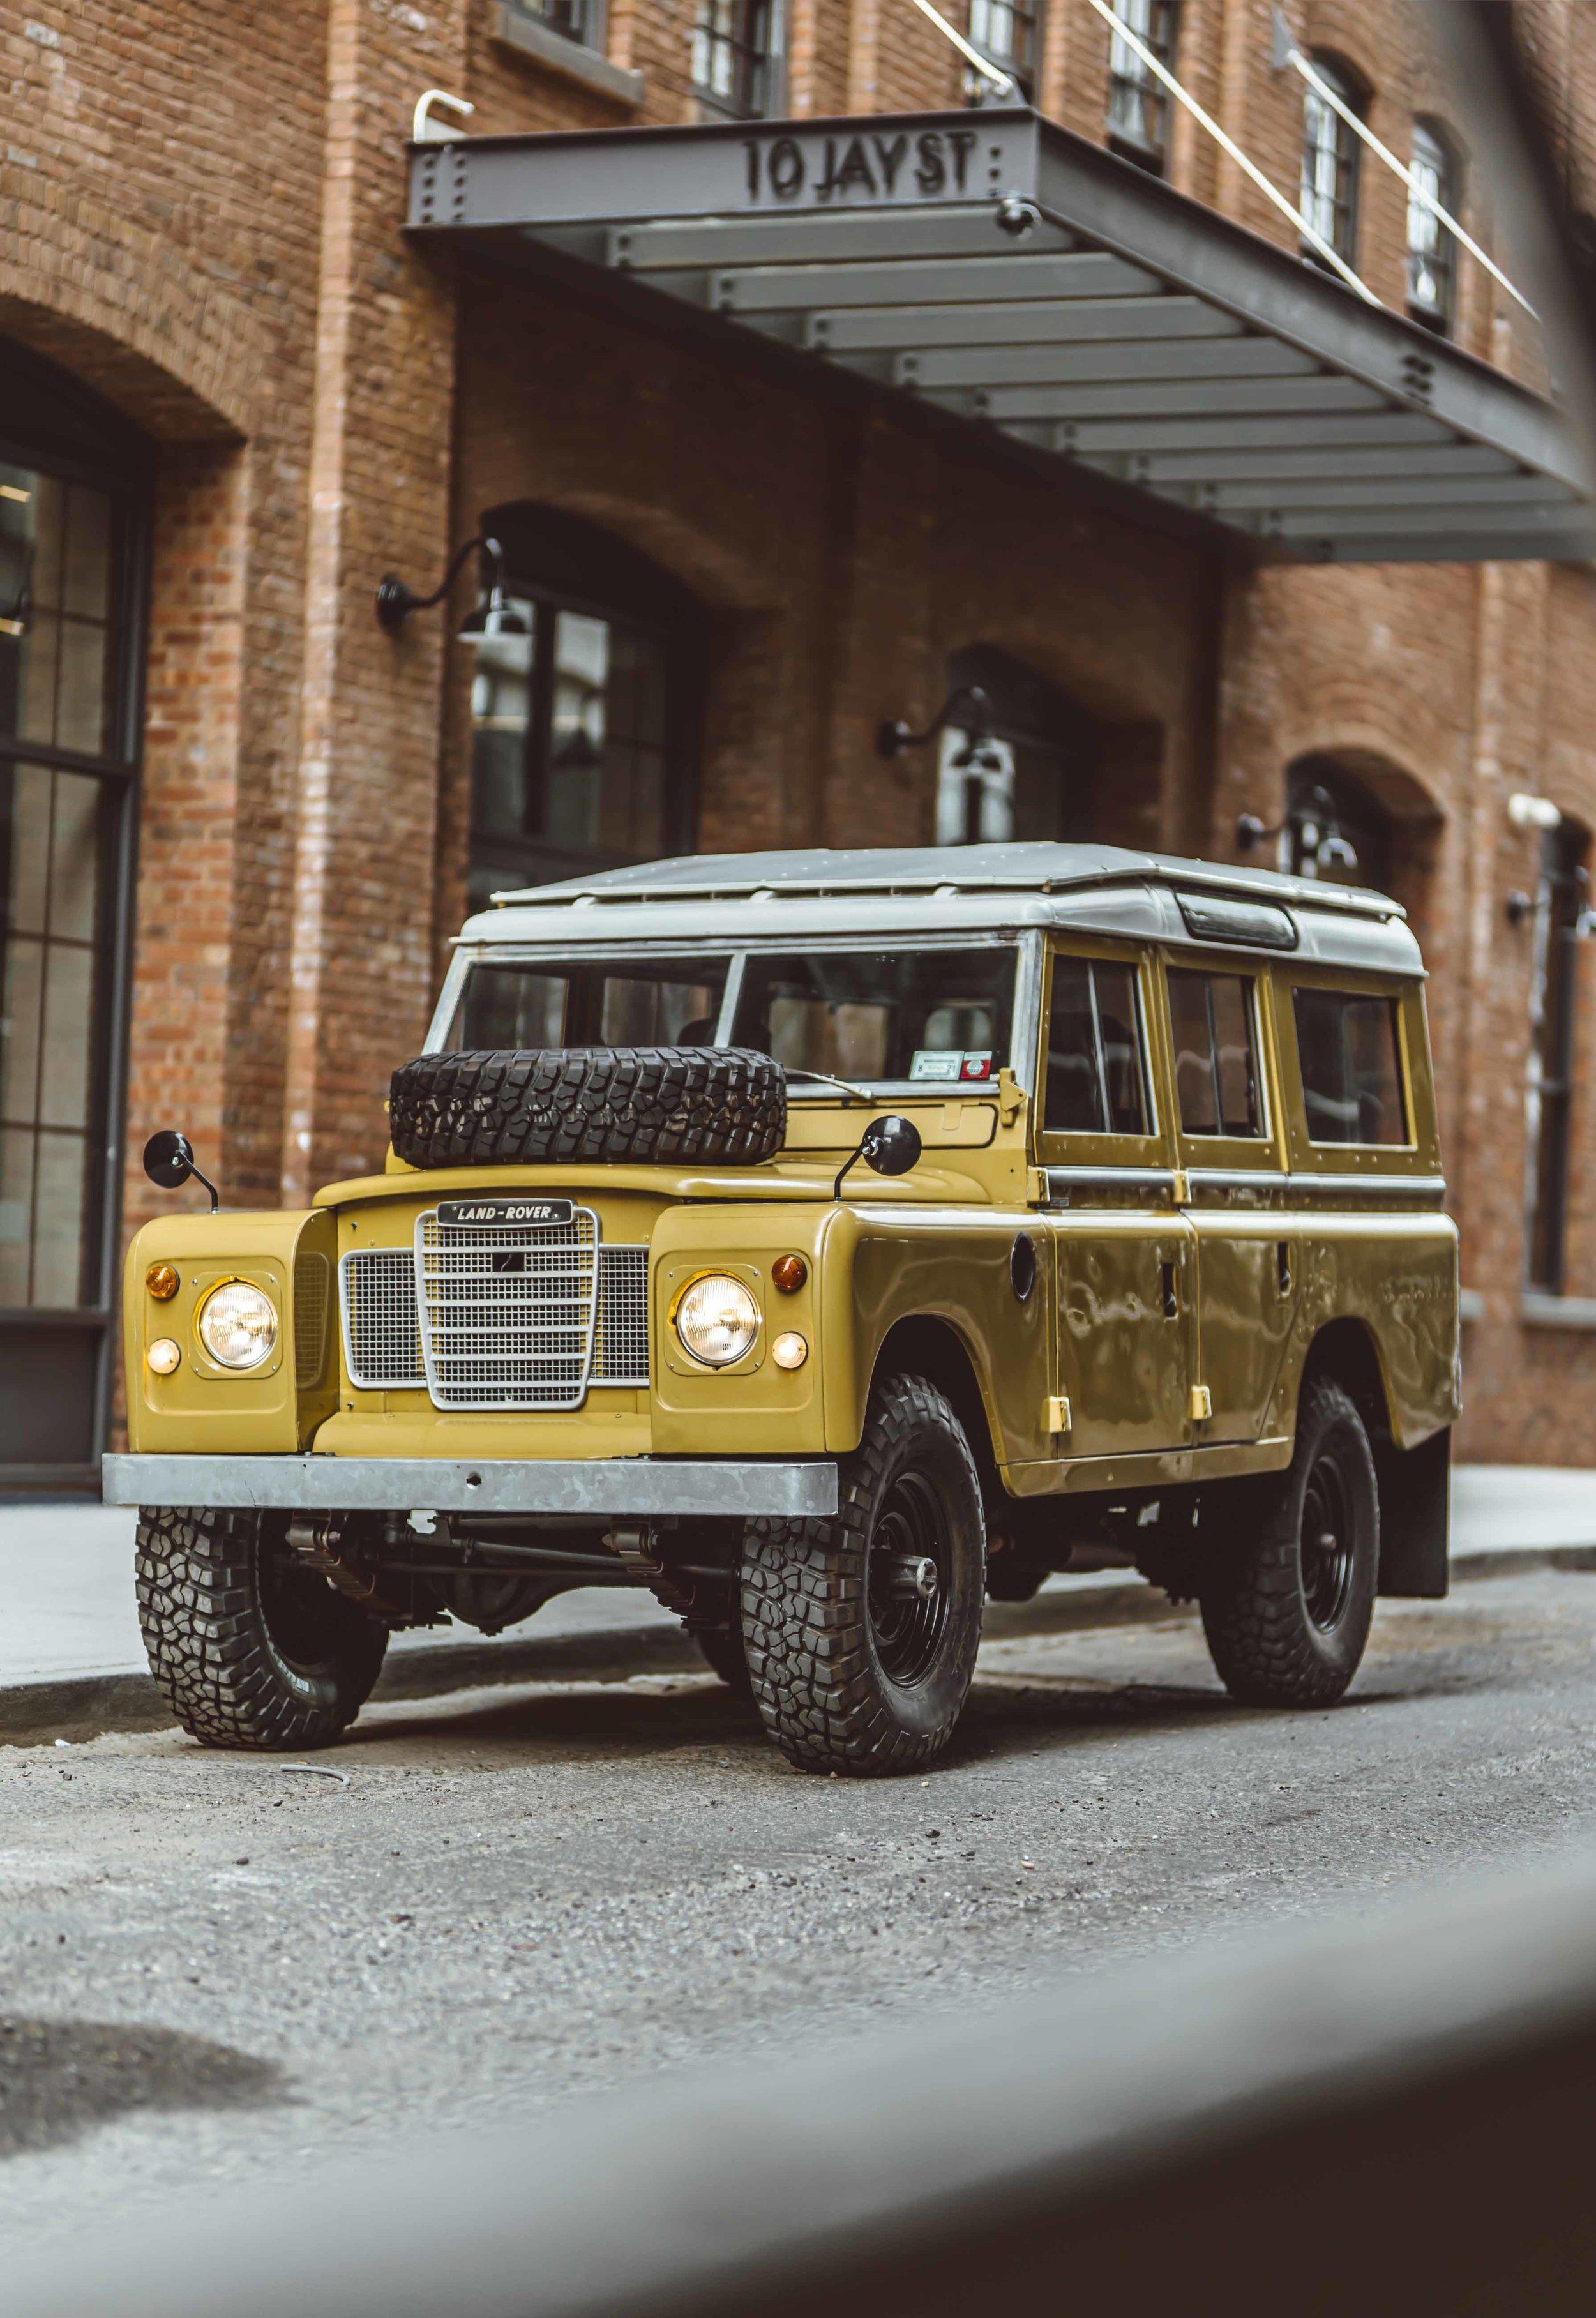 1975_Land_Rover_Series_III_109_Bahama_Gold_2XLarge_0009_Layer 13.jpg